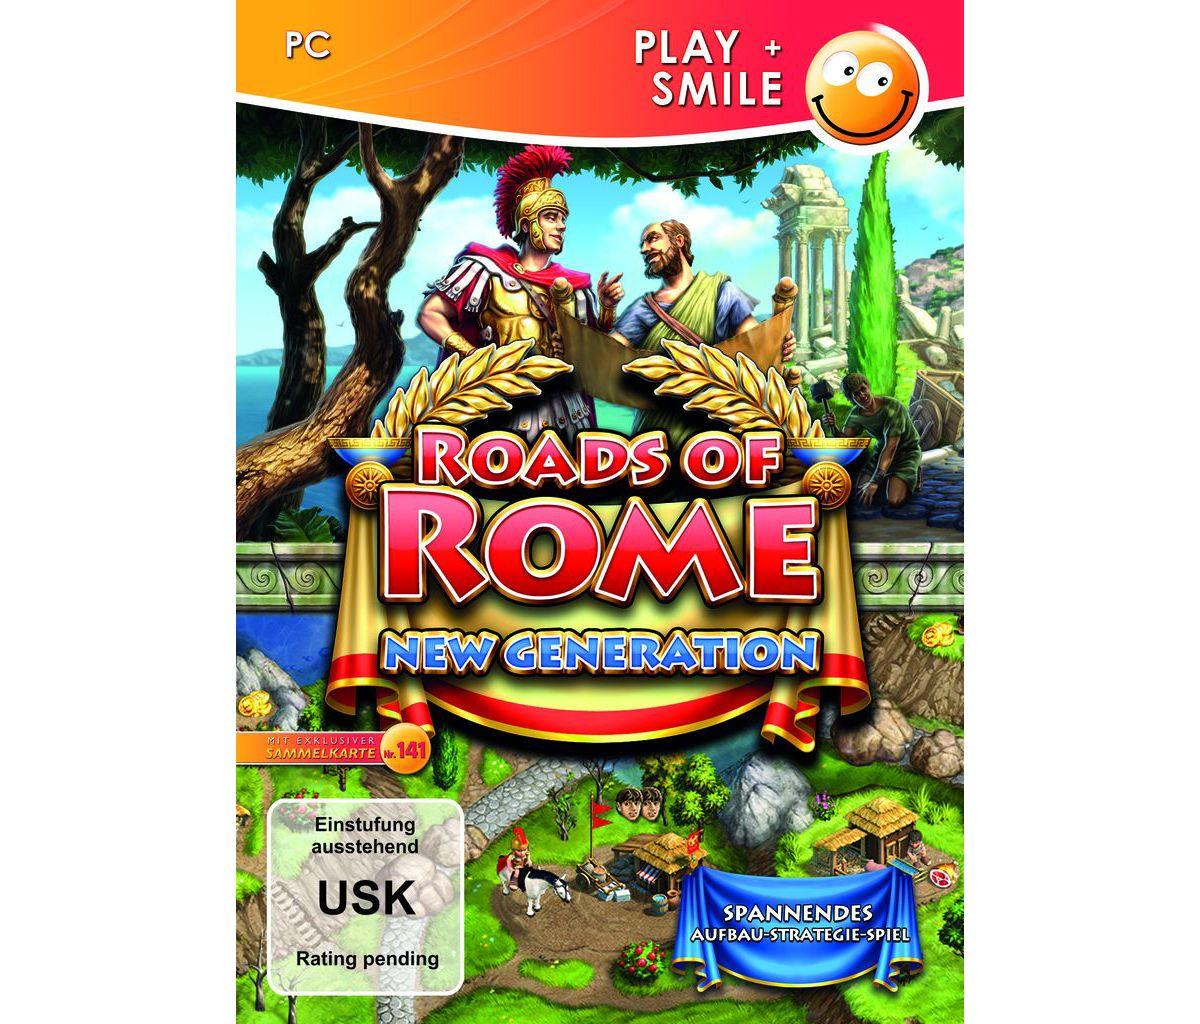 Astragon PC - Spiel »Roads of Rome: New Generat...